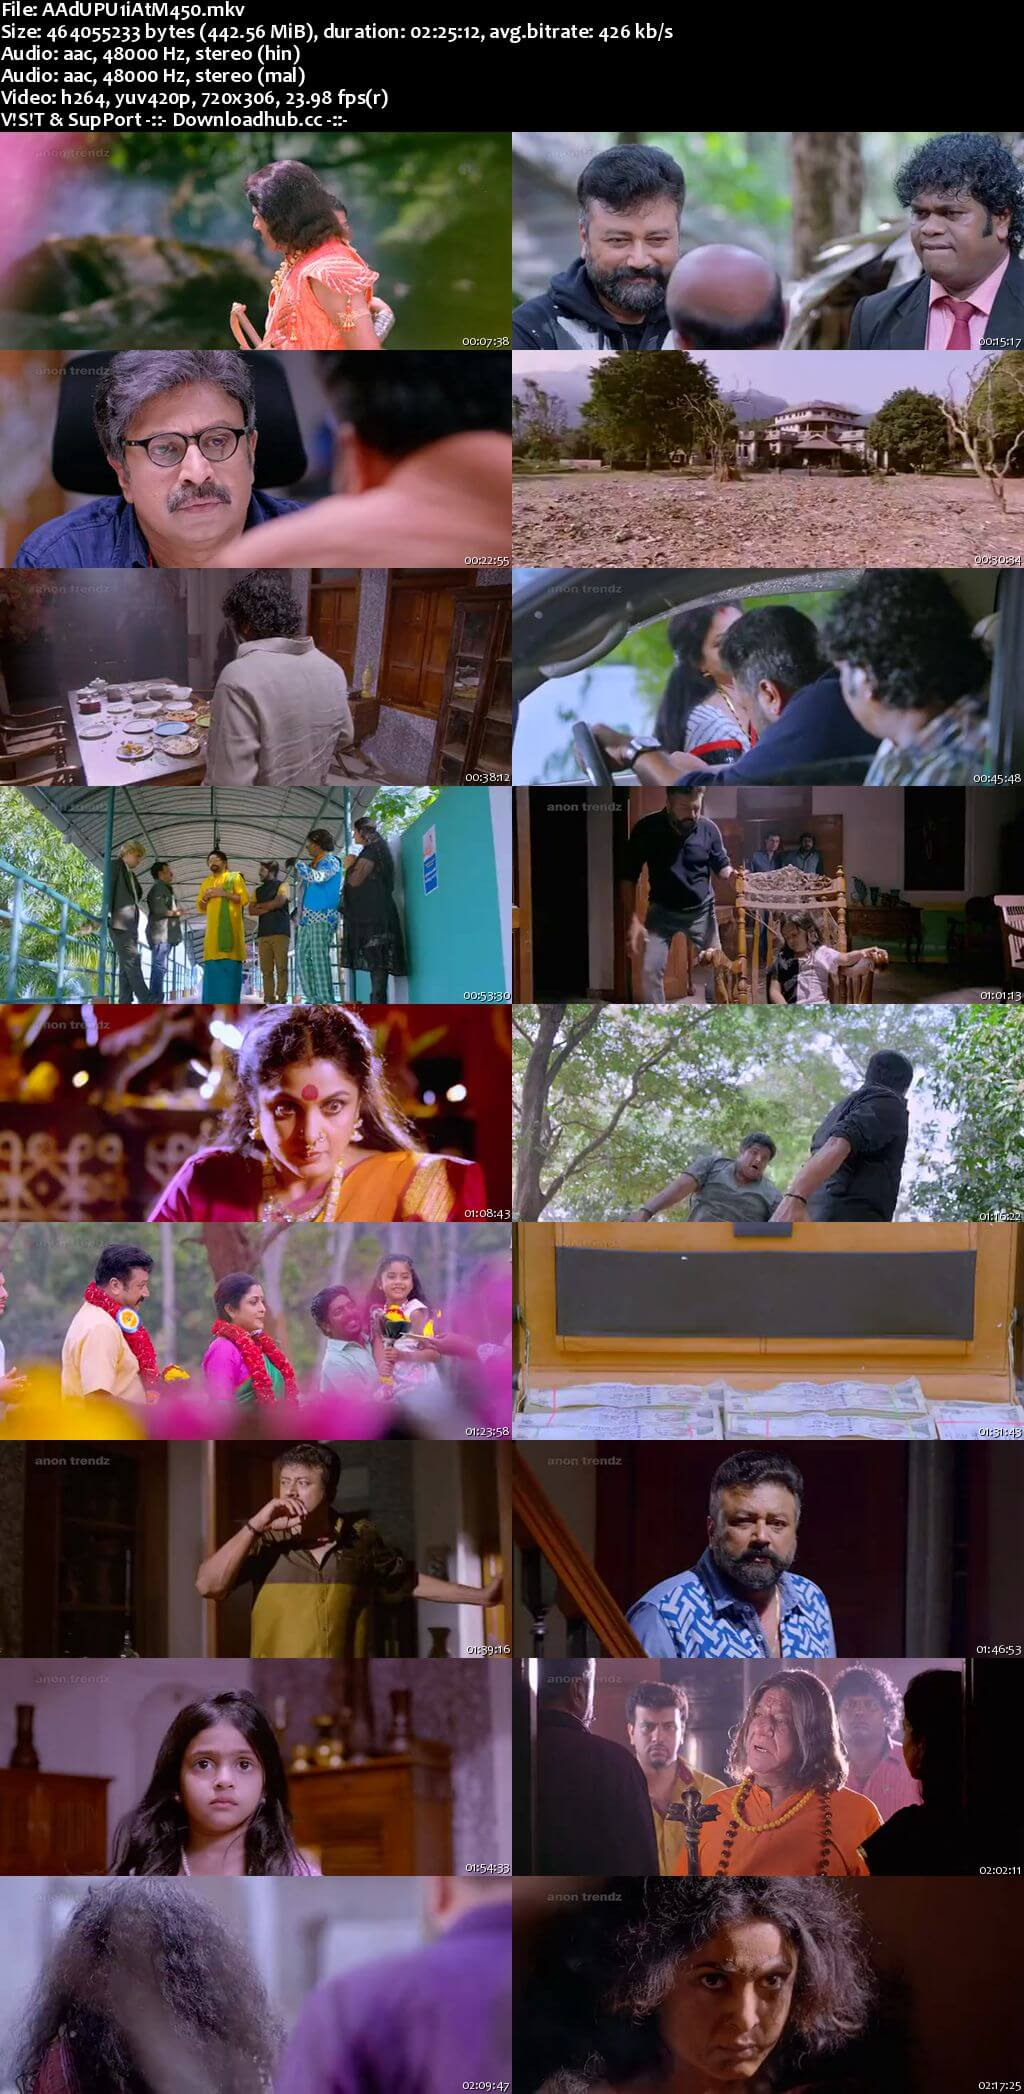 Aadupuliyattam 2016 Hindi Dual Audio 450MB UNCUT DVDRip 480p ESubs